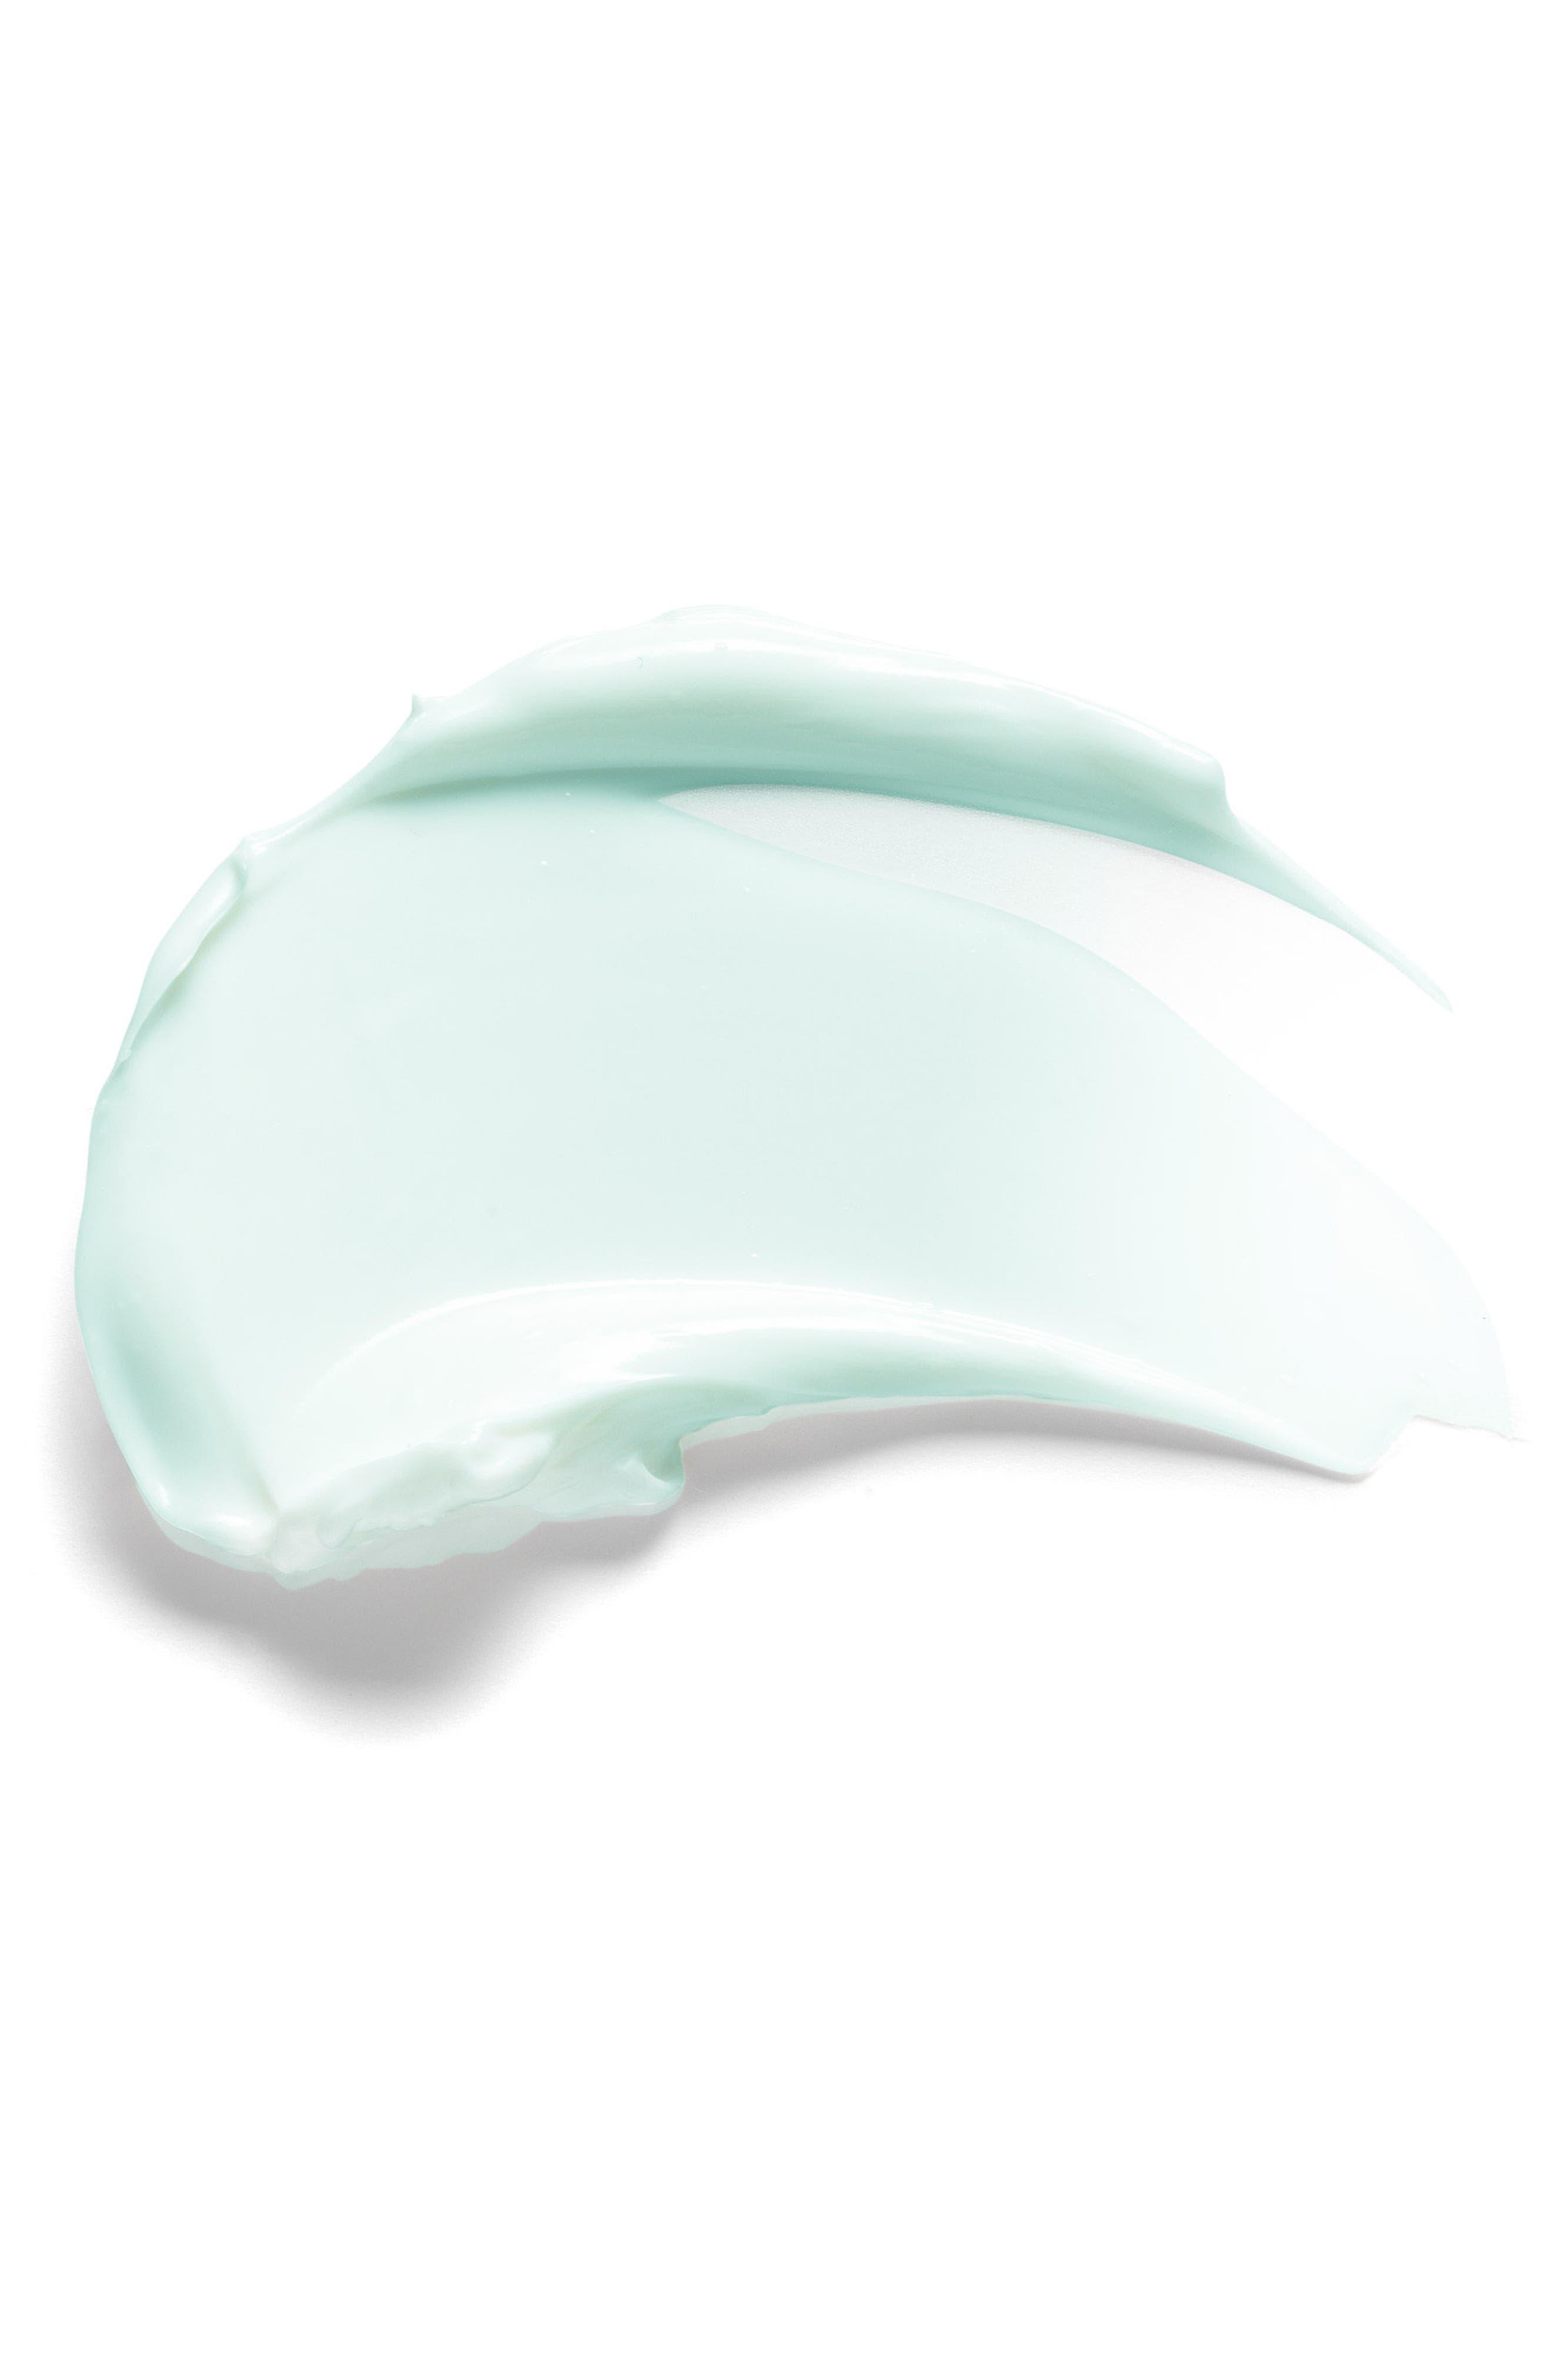 Hydraskin Light All-Day Skin Hydrating Cream-Gel,                             Alternate thumbnail 2, color,                             NO COLOR